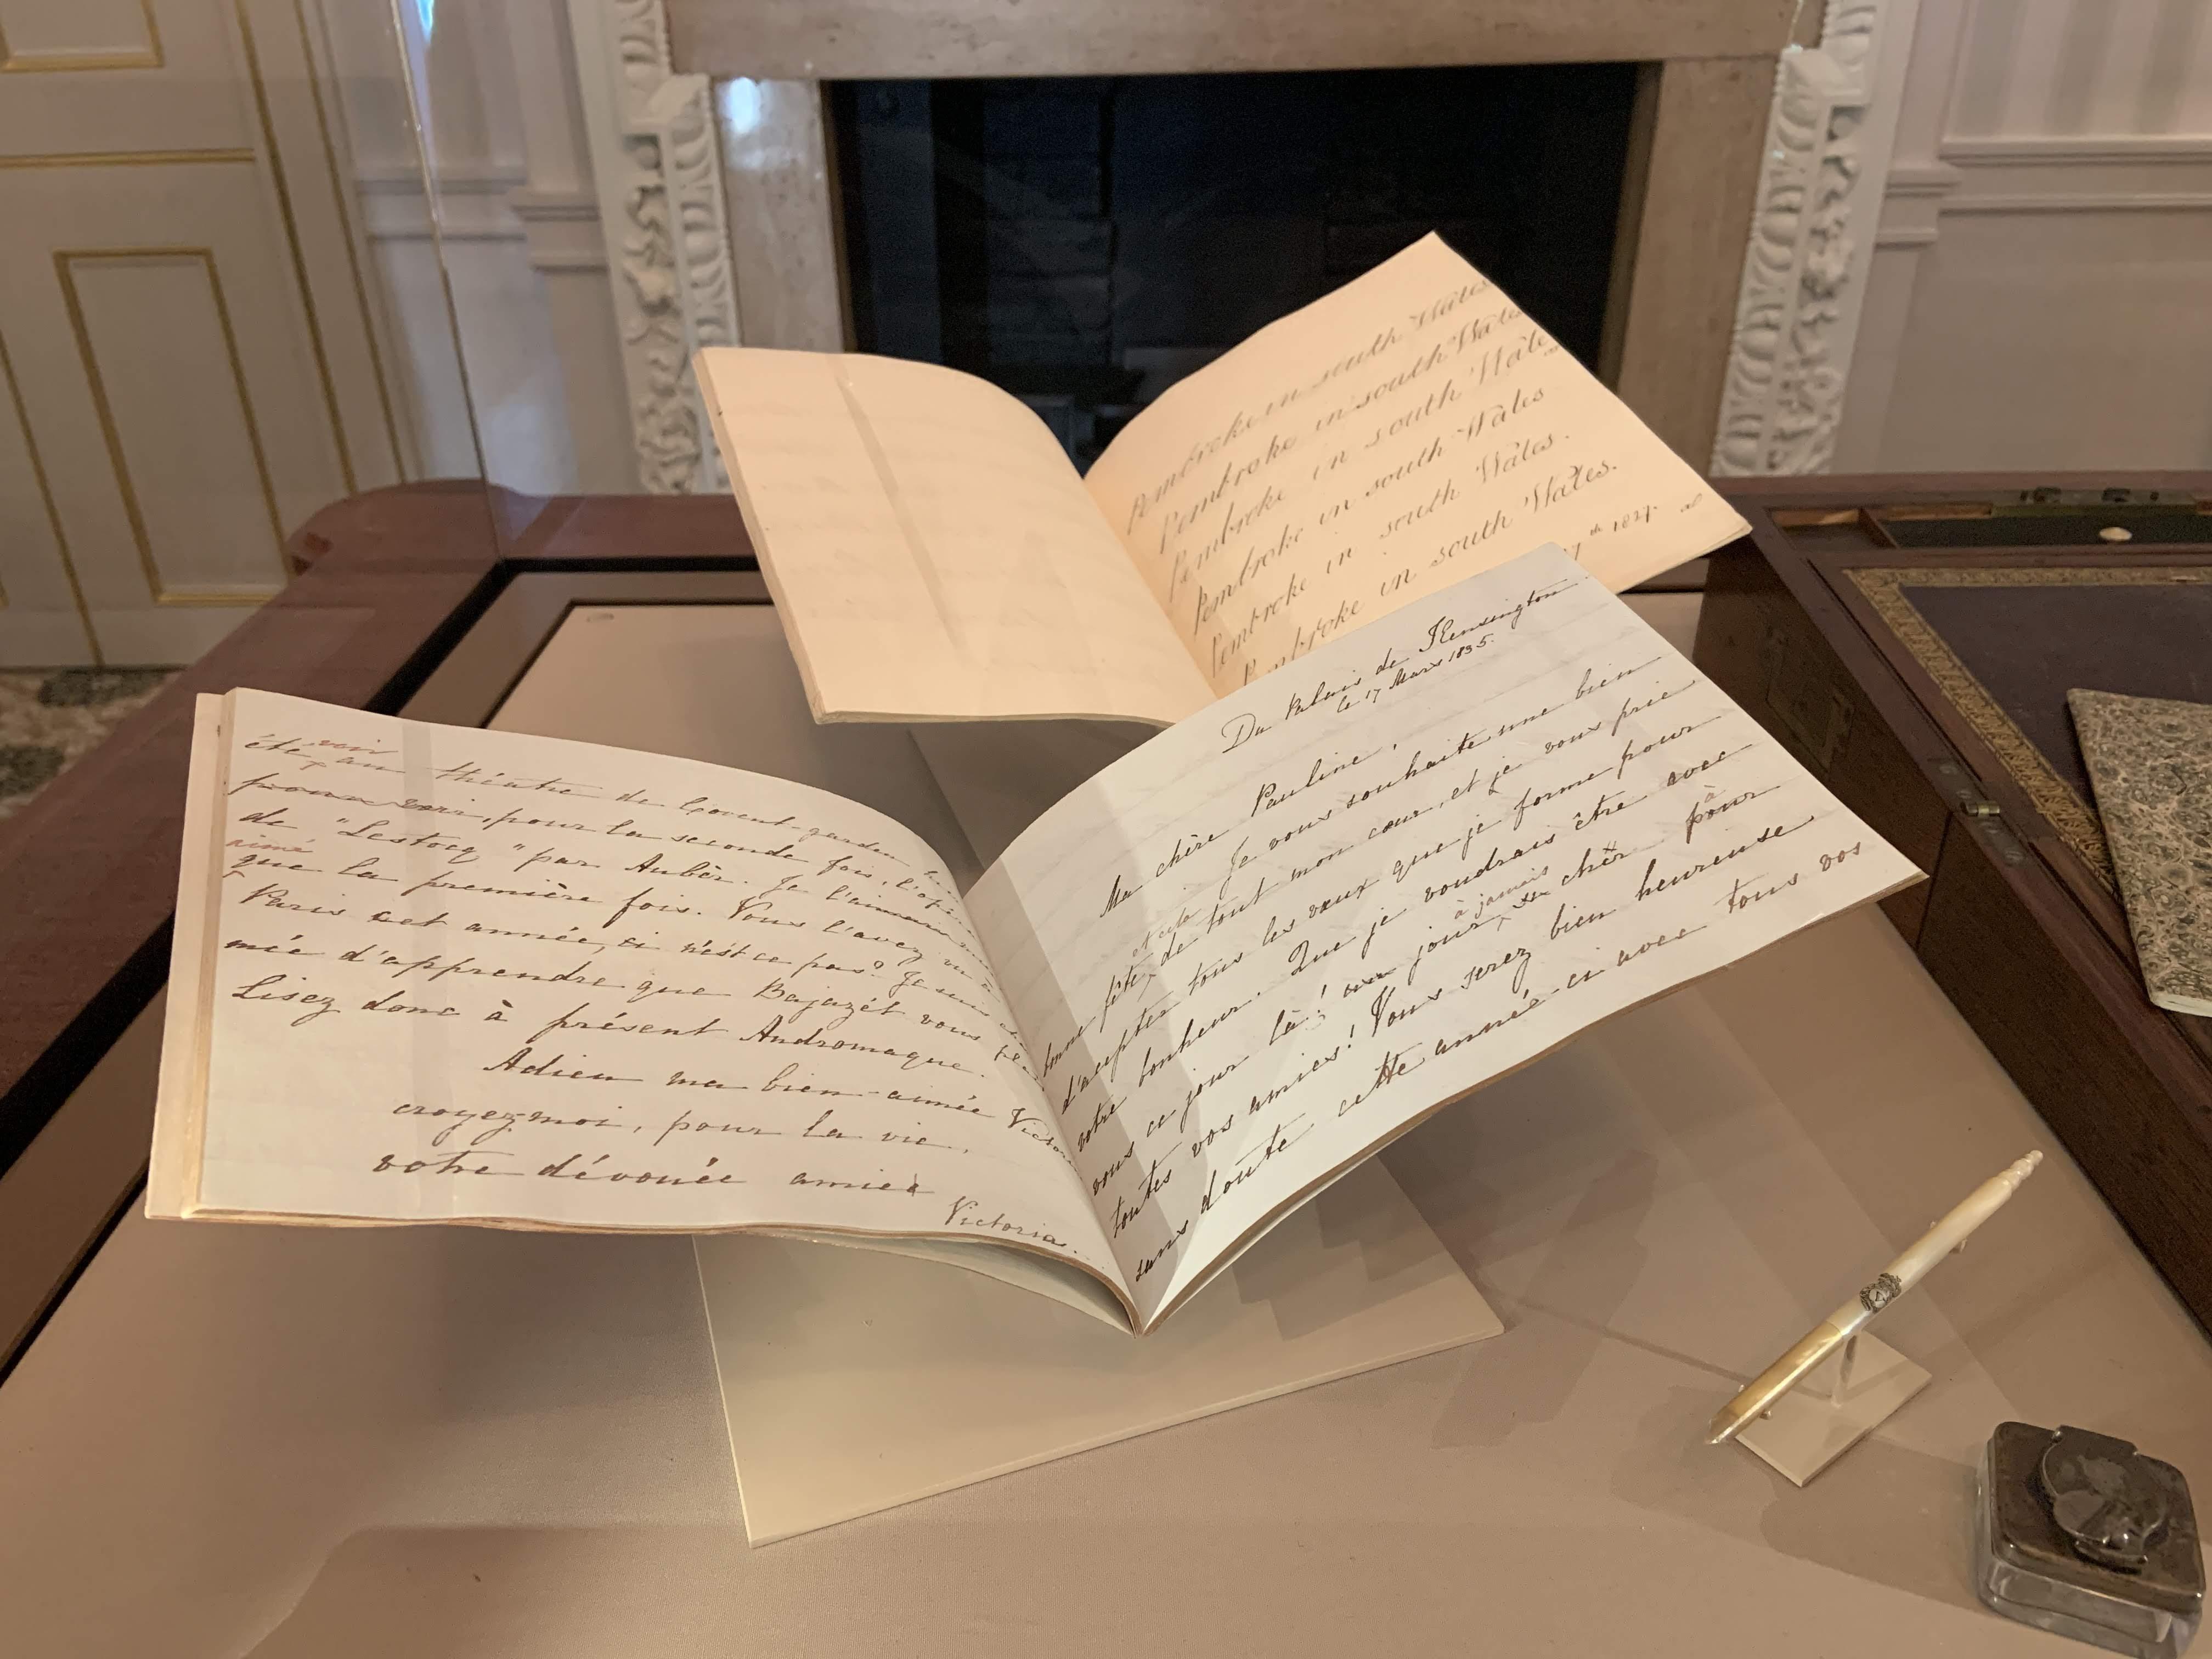 Victoria's handwriting exercise books, 1827